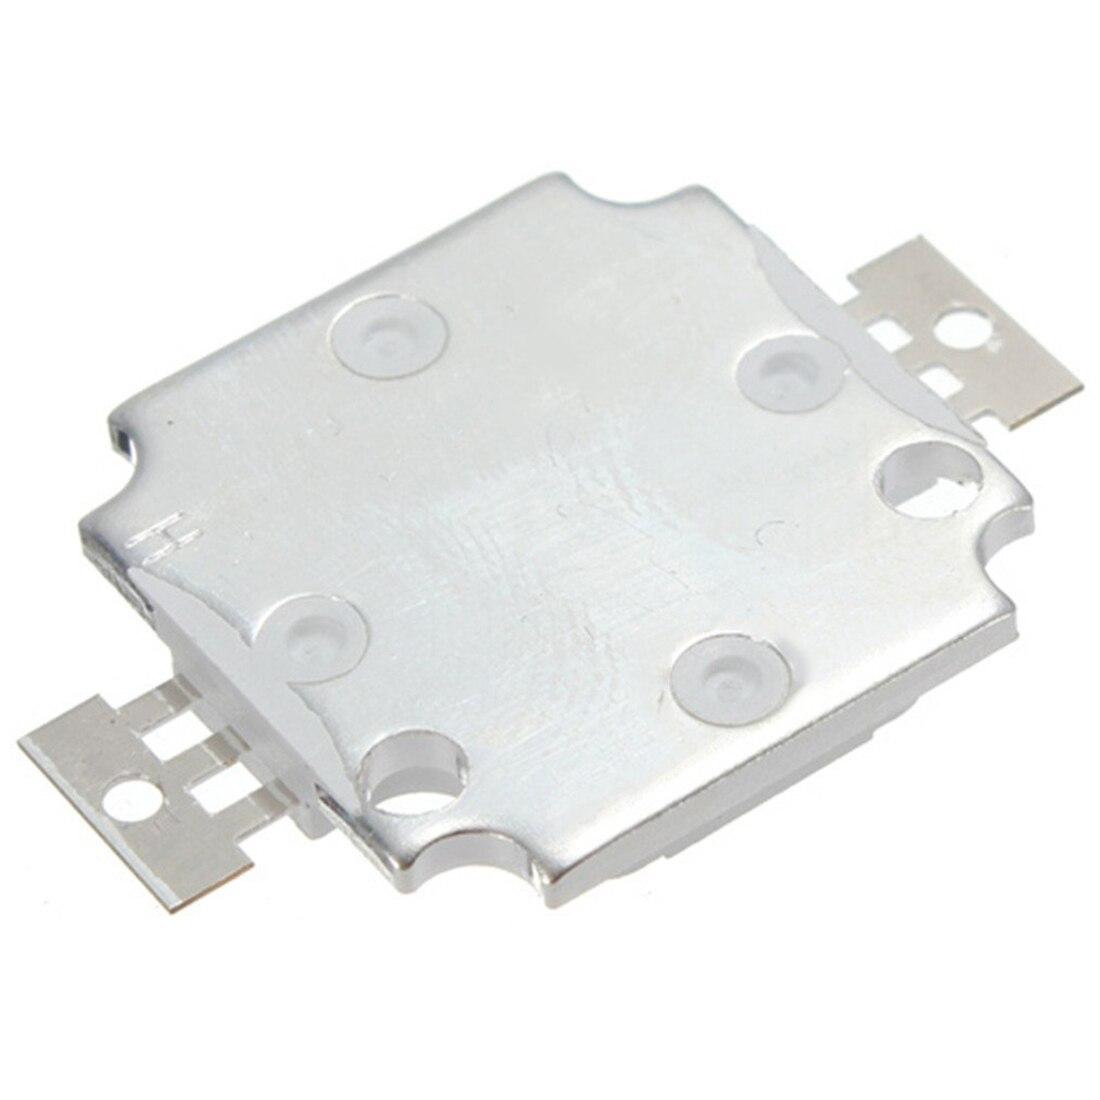 4 X 10W 900LM Warm White High Brightness LED Lamp Chip DC 9-12V